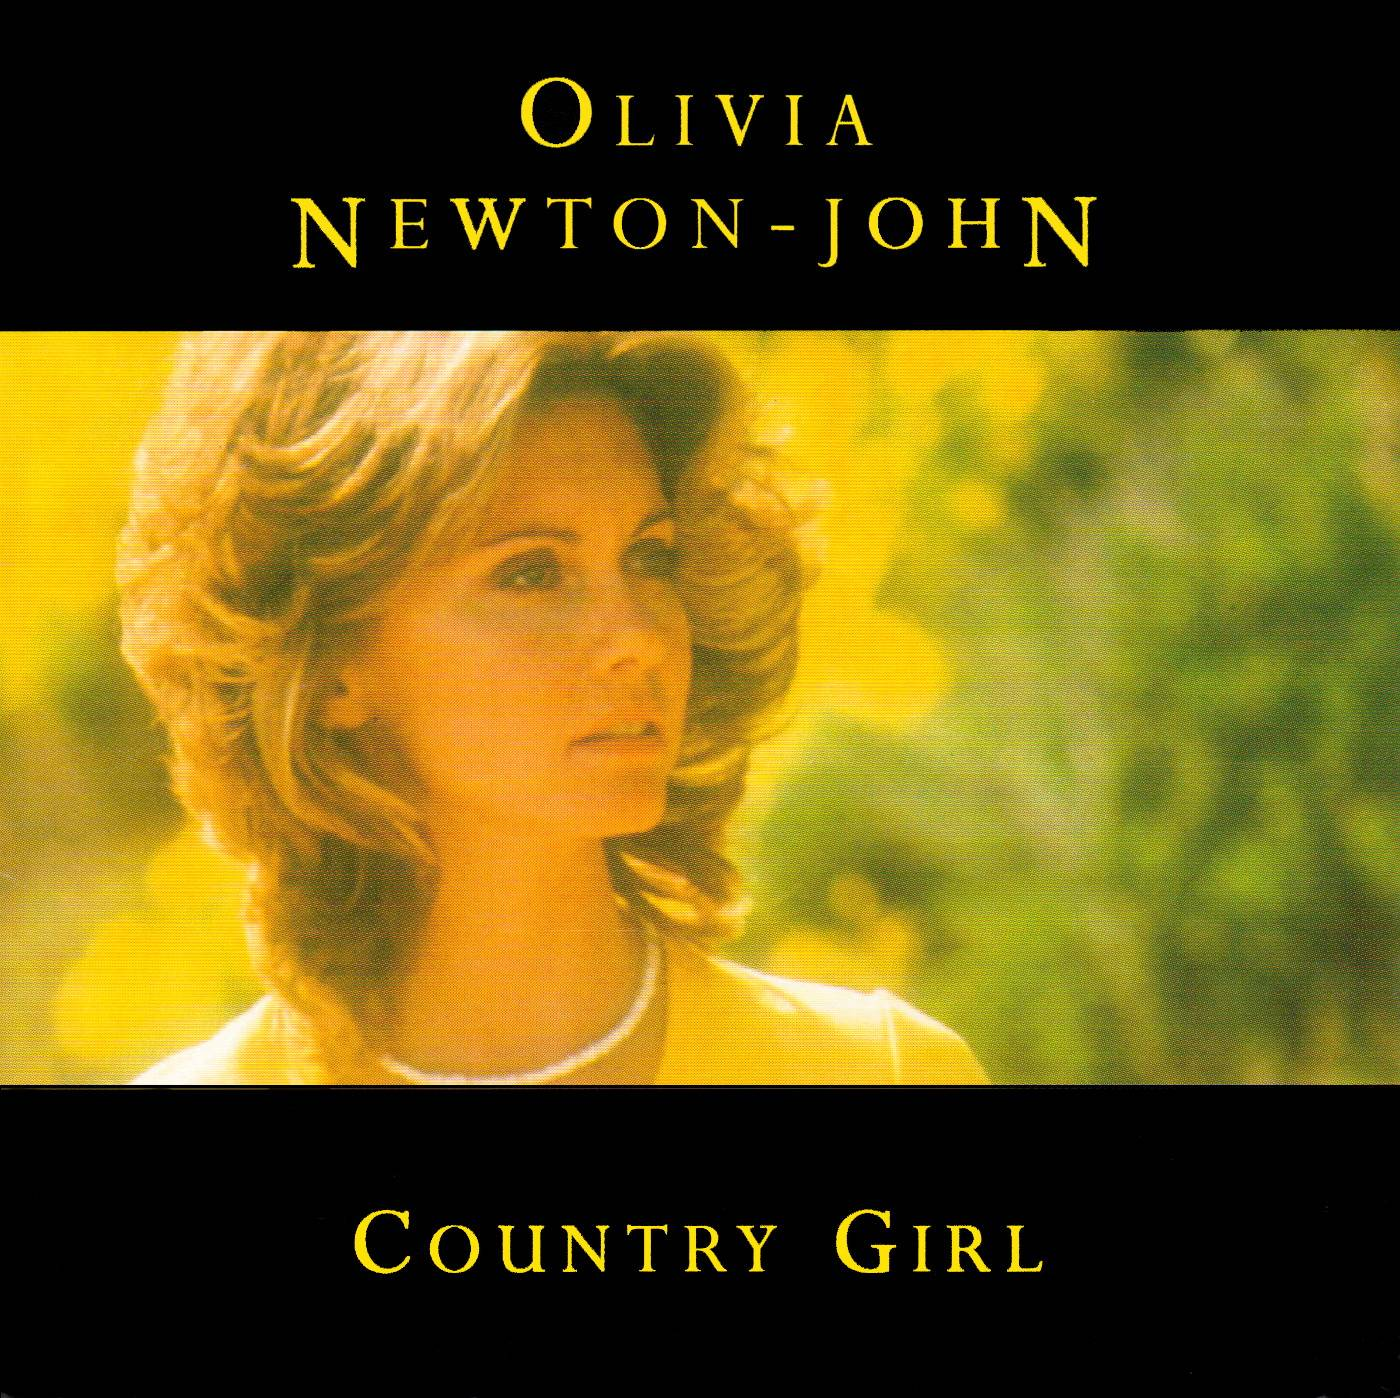 Olivia Newton-John - Country Girl (1998) *Re-Up* *New Rip*